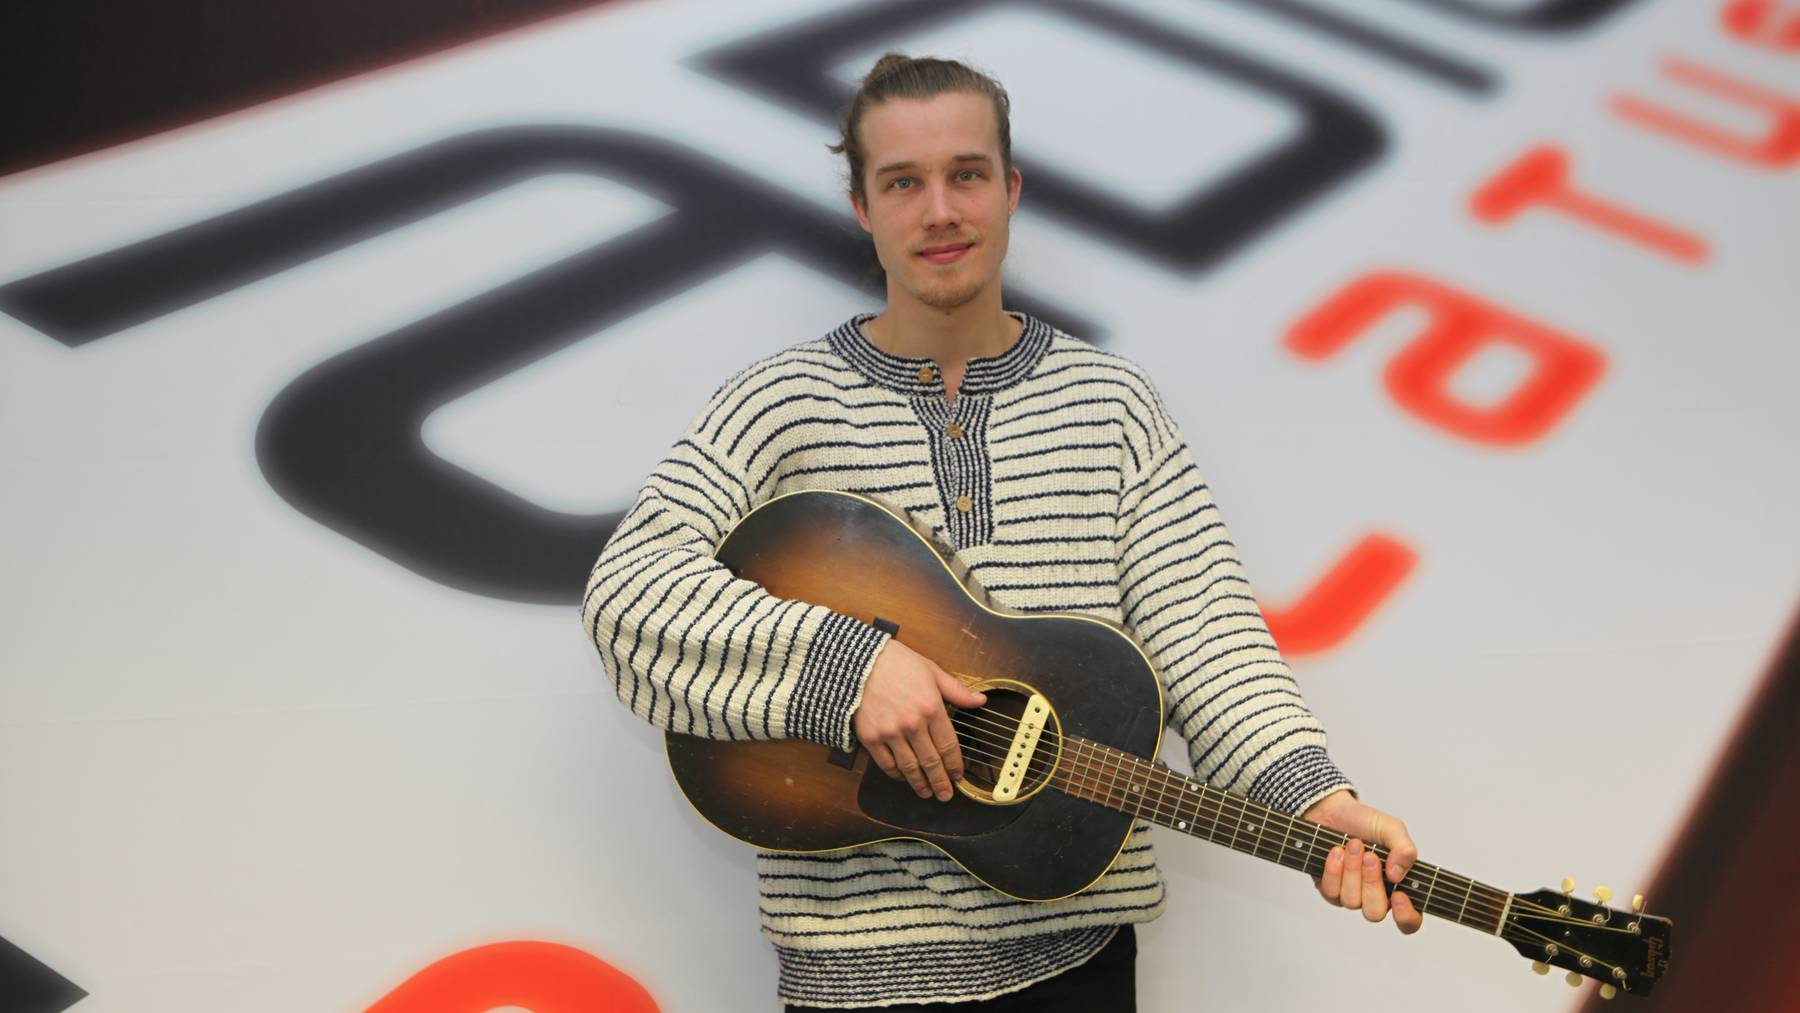 Andreas Moe der Newcomer am Musikhimmel